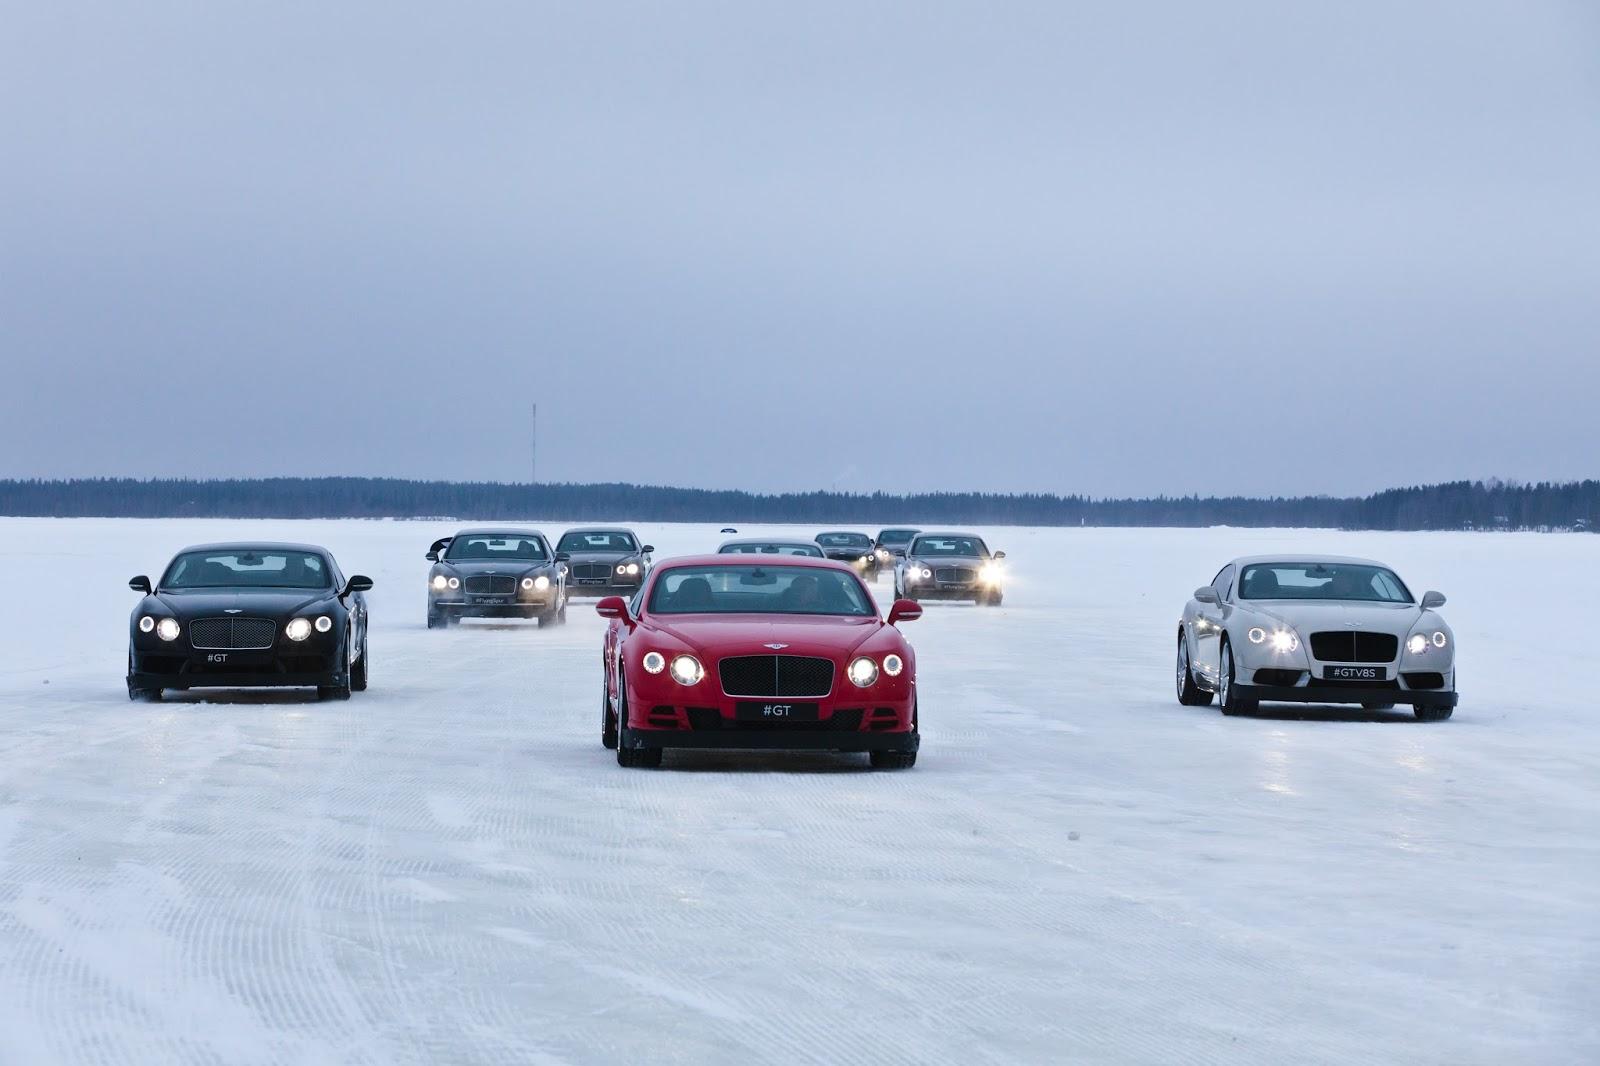 Bentayga%2Bmakes%2BPower%2Bon%2BIce%2BDebut%2B Οδήγησε την Bentley Bentayga παρέα με τον Juha Kankkunen